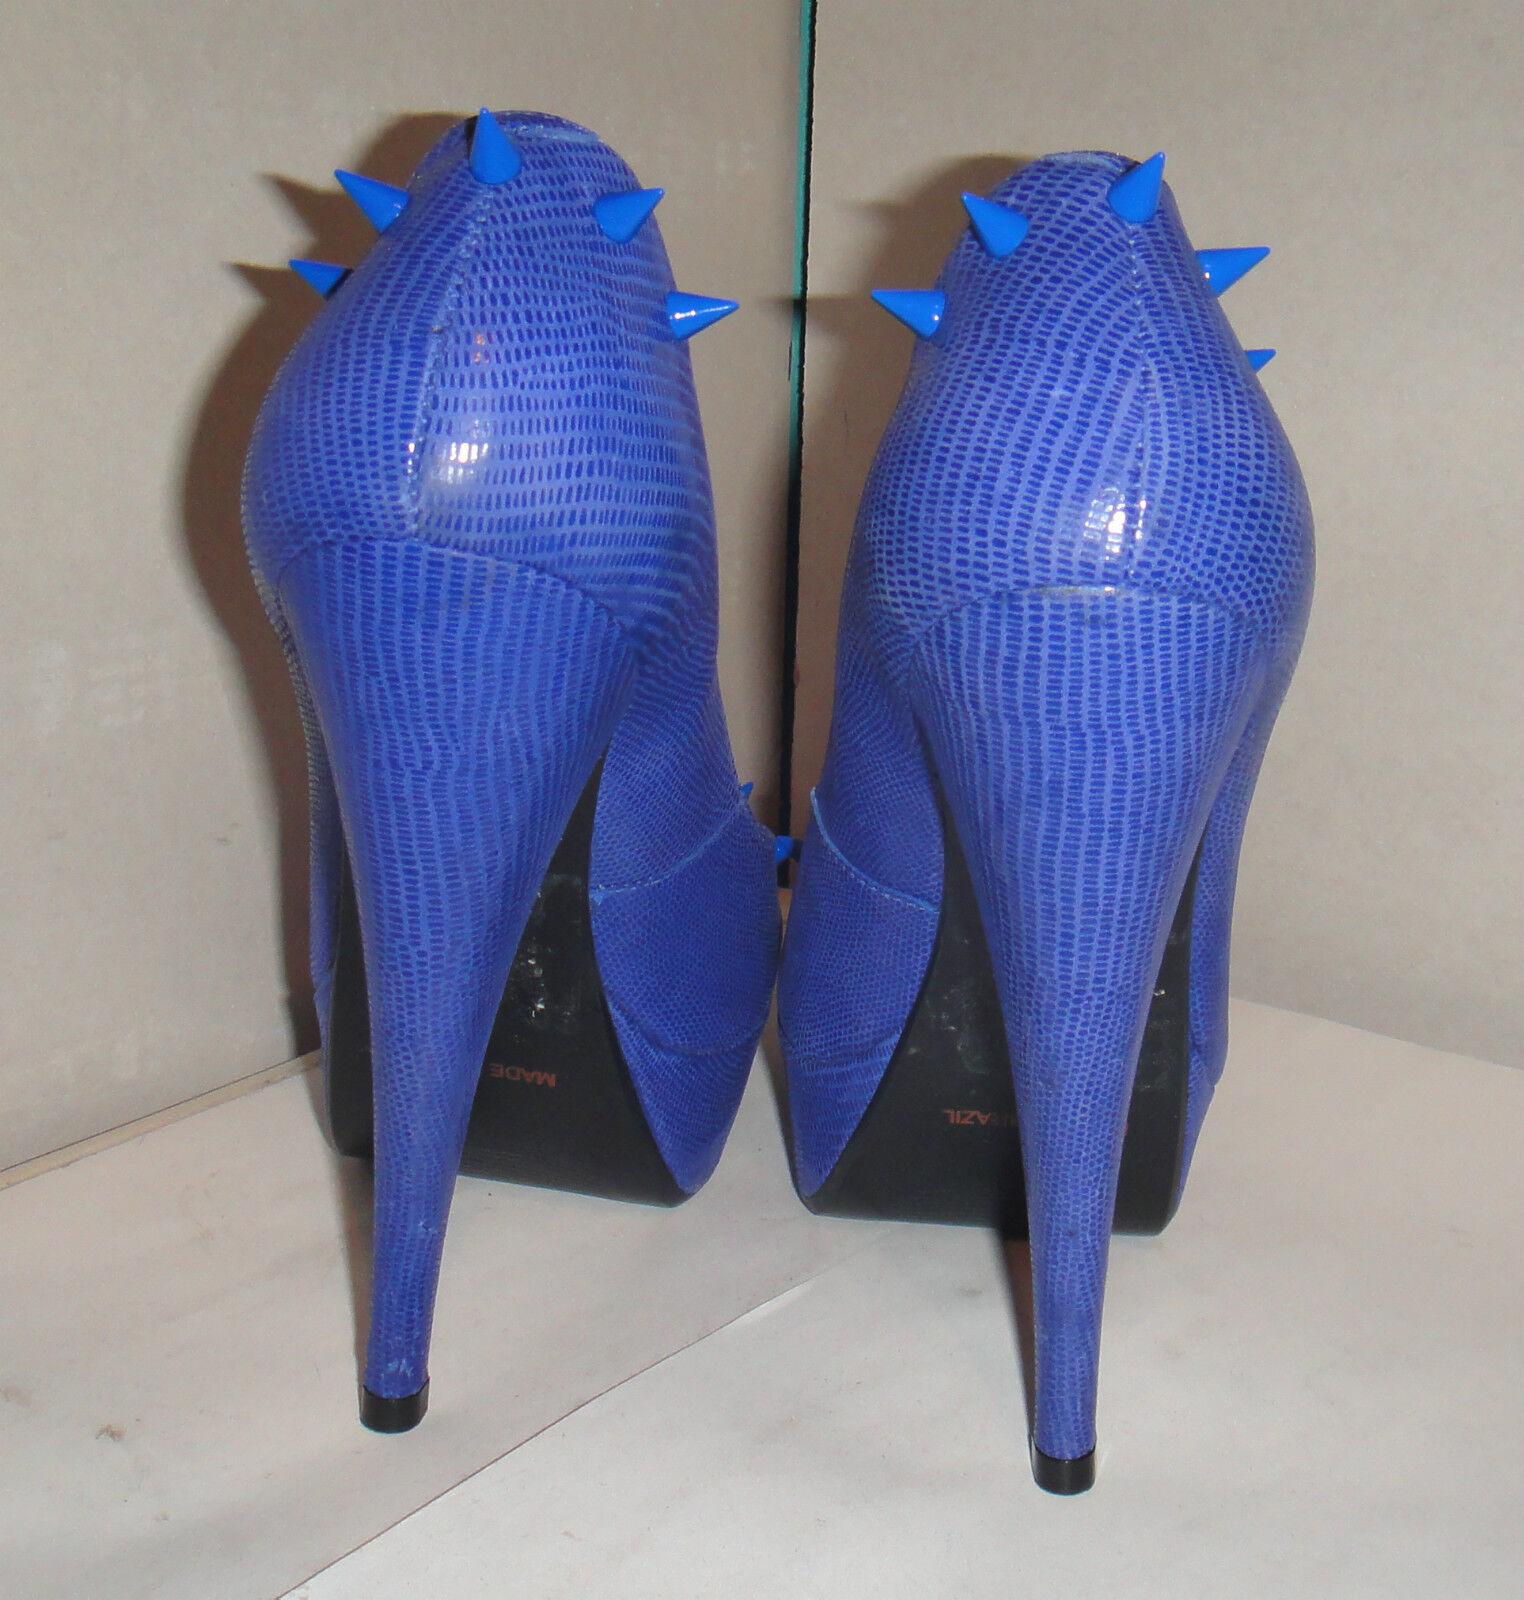 TOPSHOP CHELISE STRIKE Blau LEATHER PLATFORM KITSCH SPIKE 38 STUD ROCK Schuhe 5 38 SPIKE 7e4b78